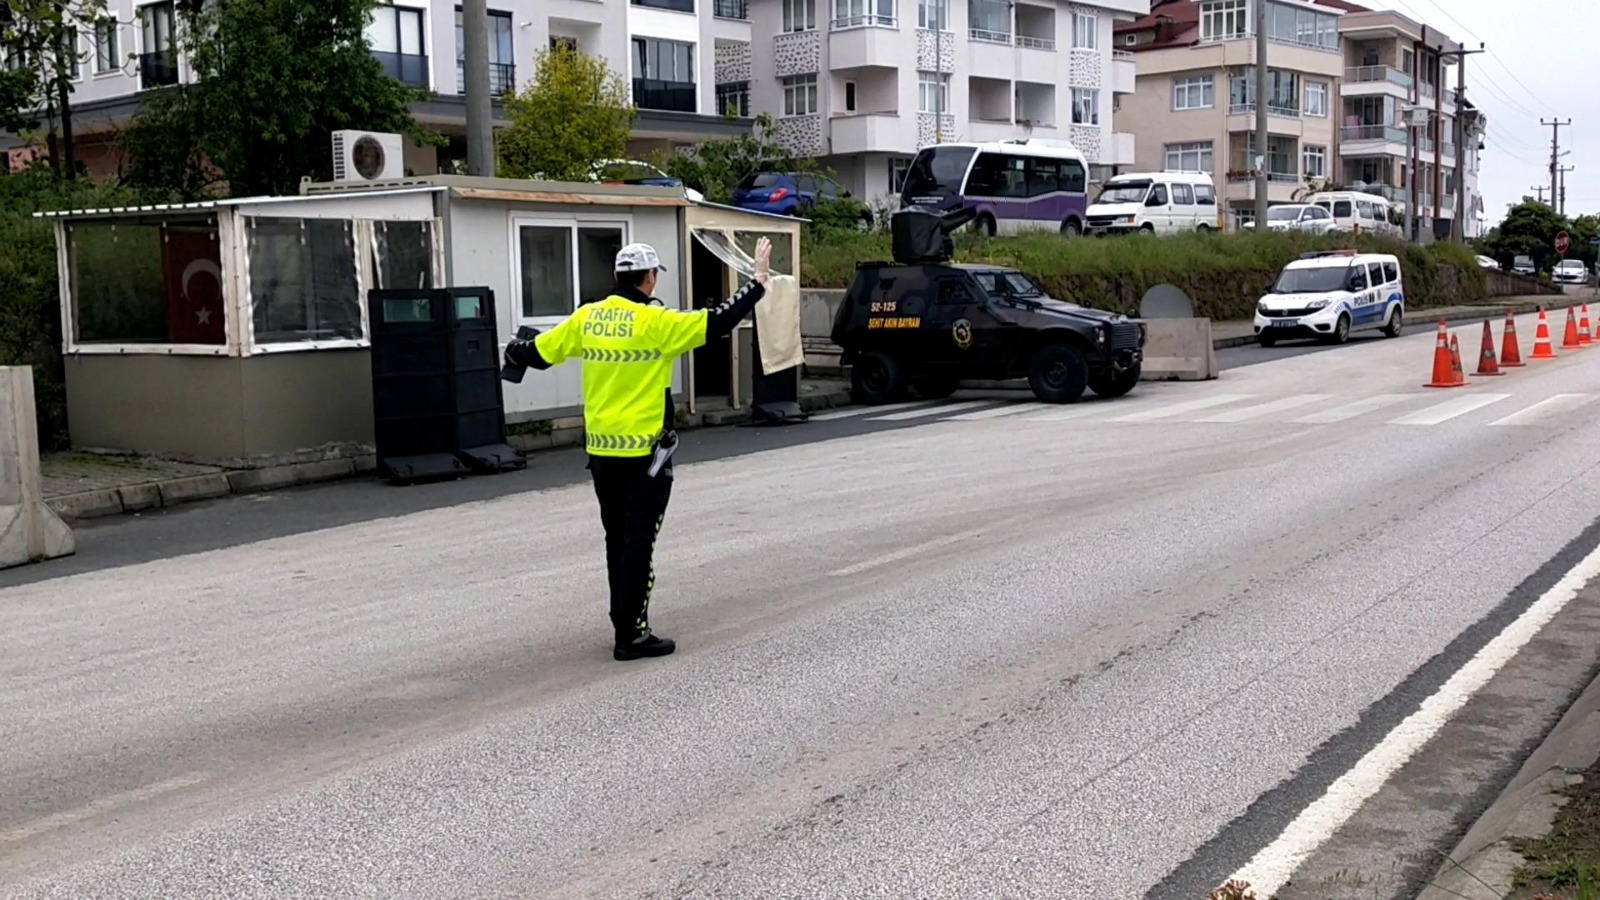 Ehliyetsiz sürücü 1200 km yol kat edip İstanbul'dan Trabzon'a geldi